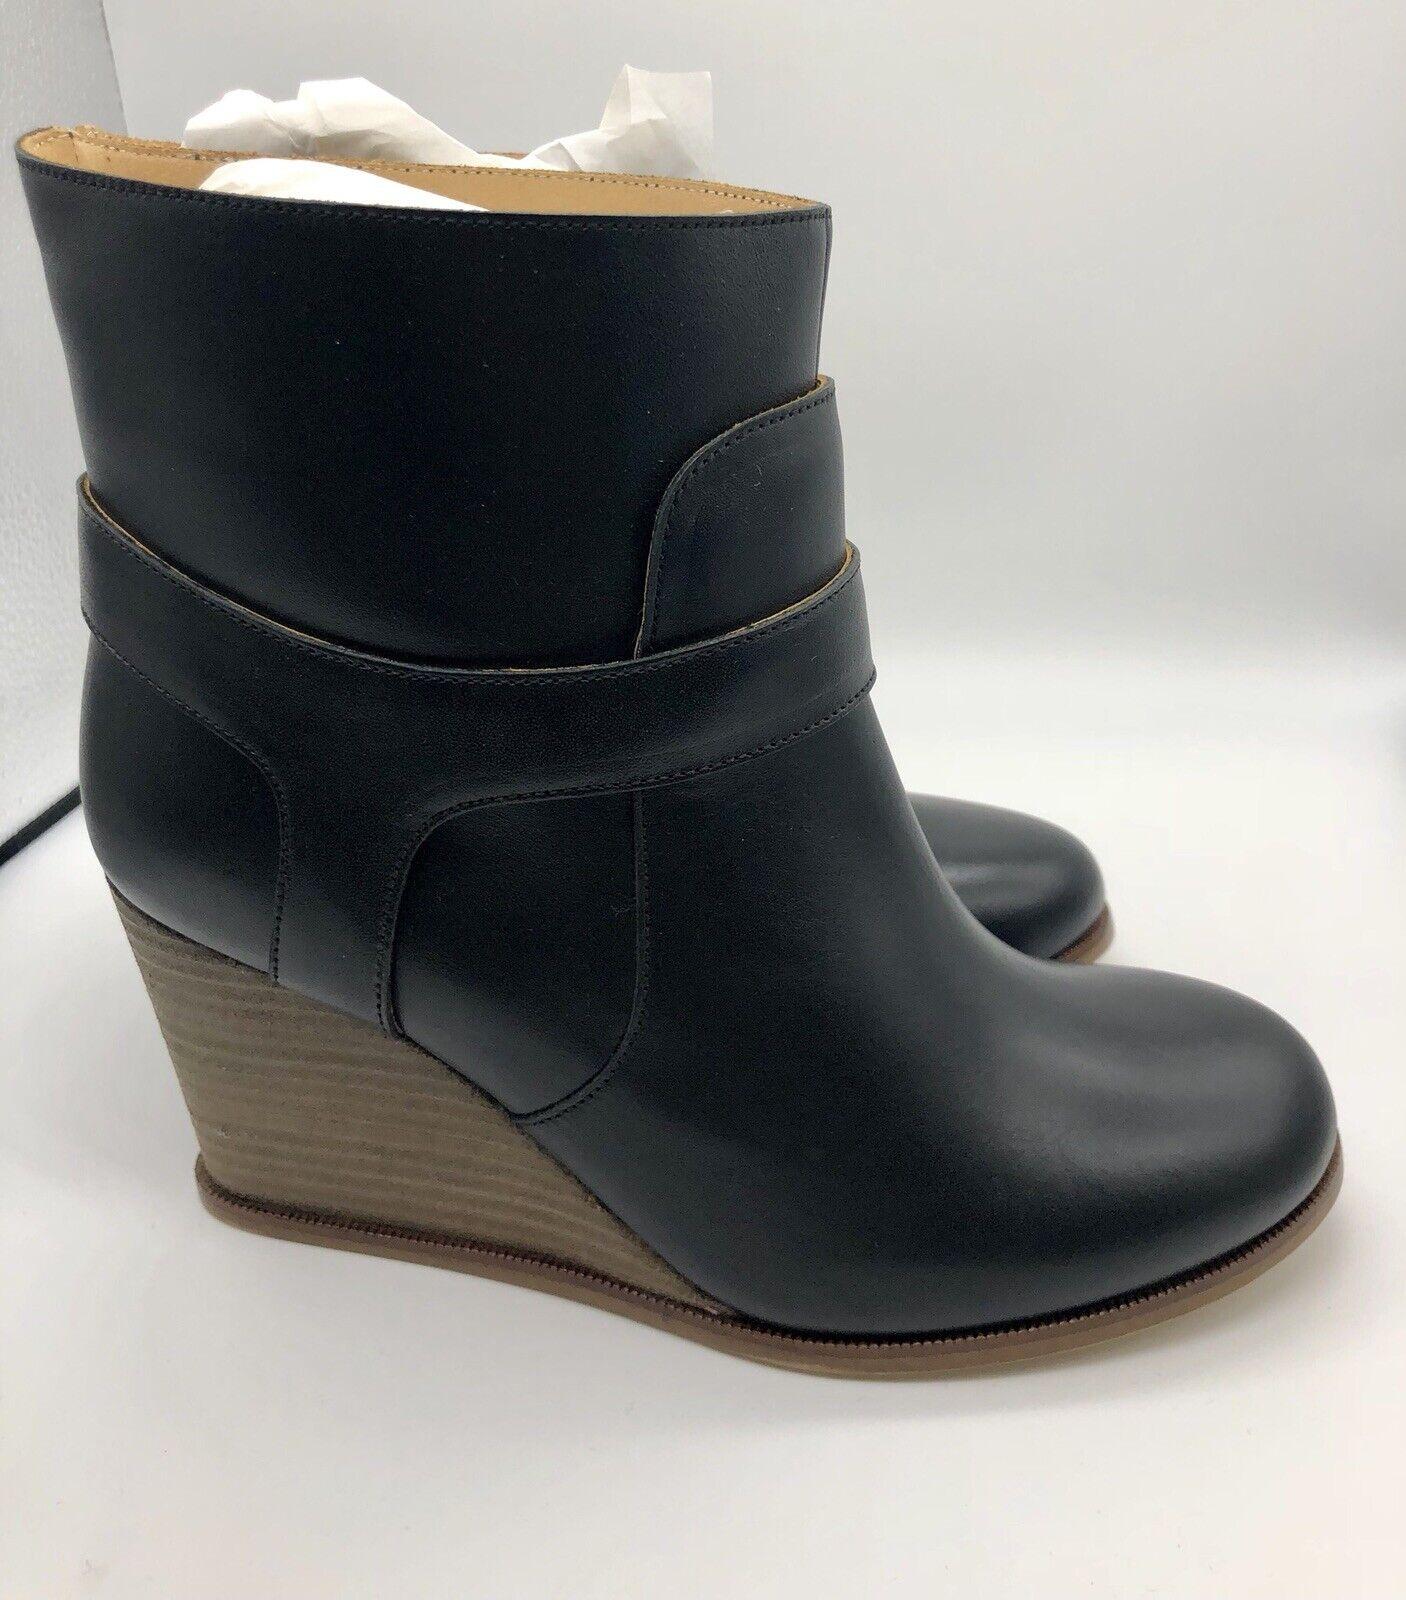 NEW MM6 MAISON MARTIN MARGIELA Black Leather Ankle Boots Sz 6